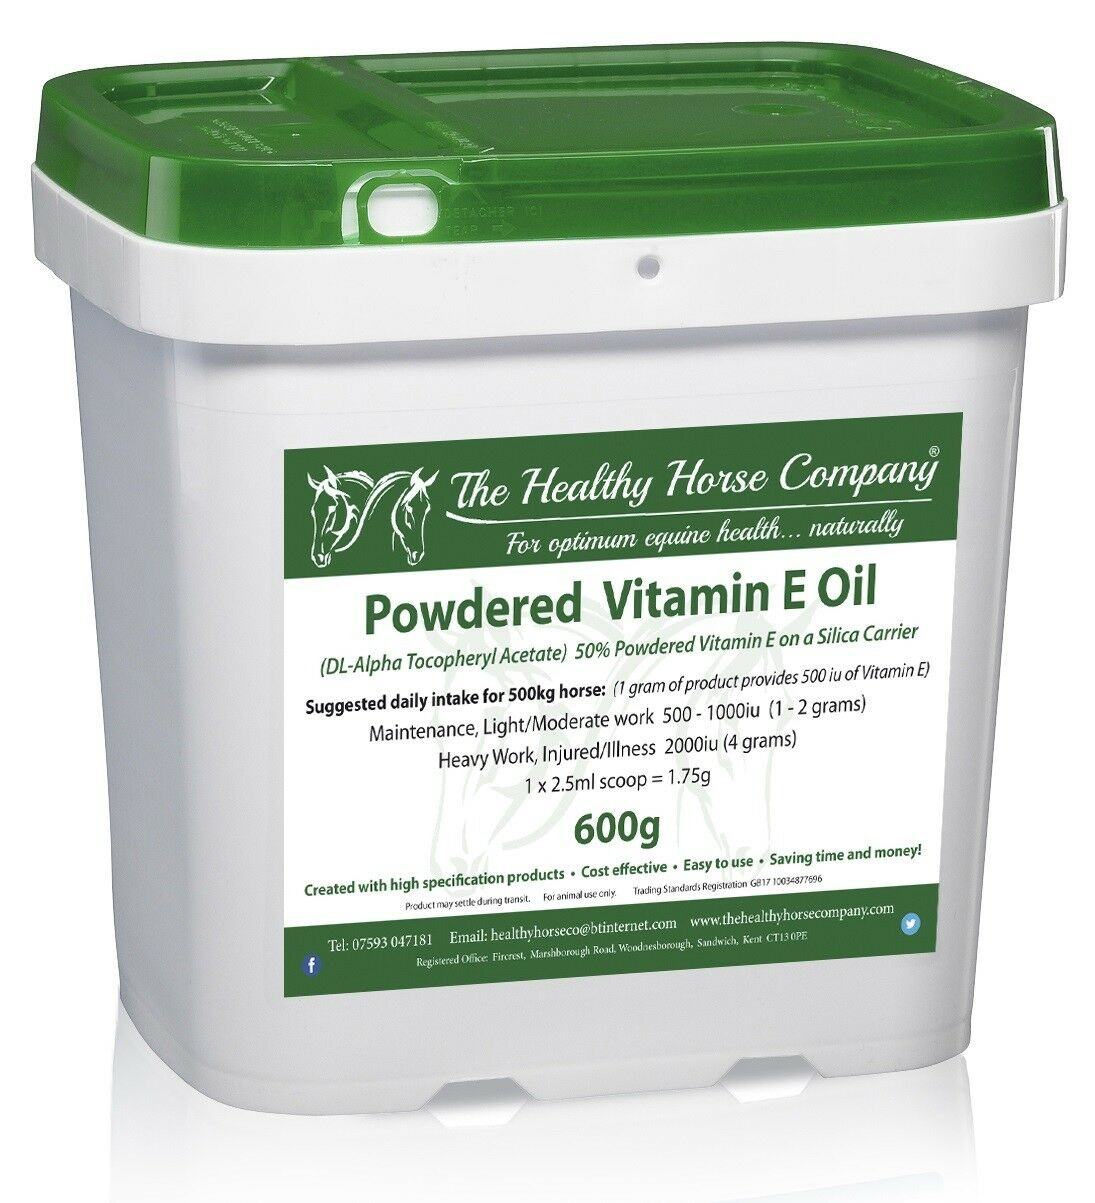 Vitamin E Oil - 600g Refill (Powder) Silica Carrier